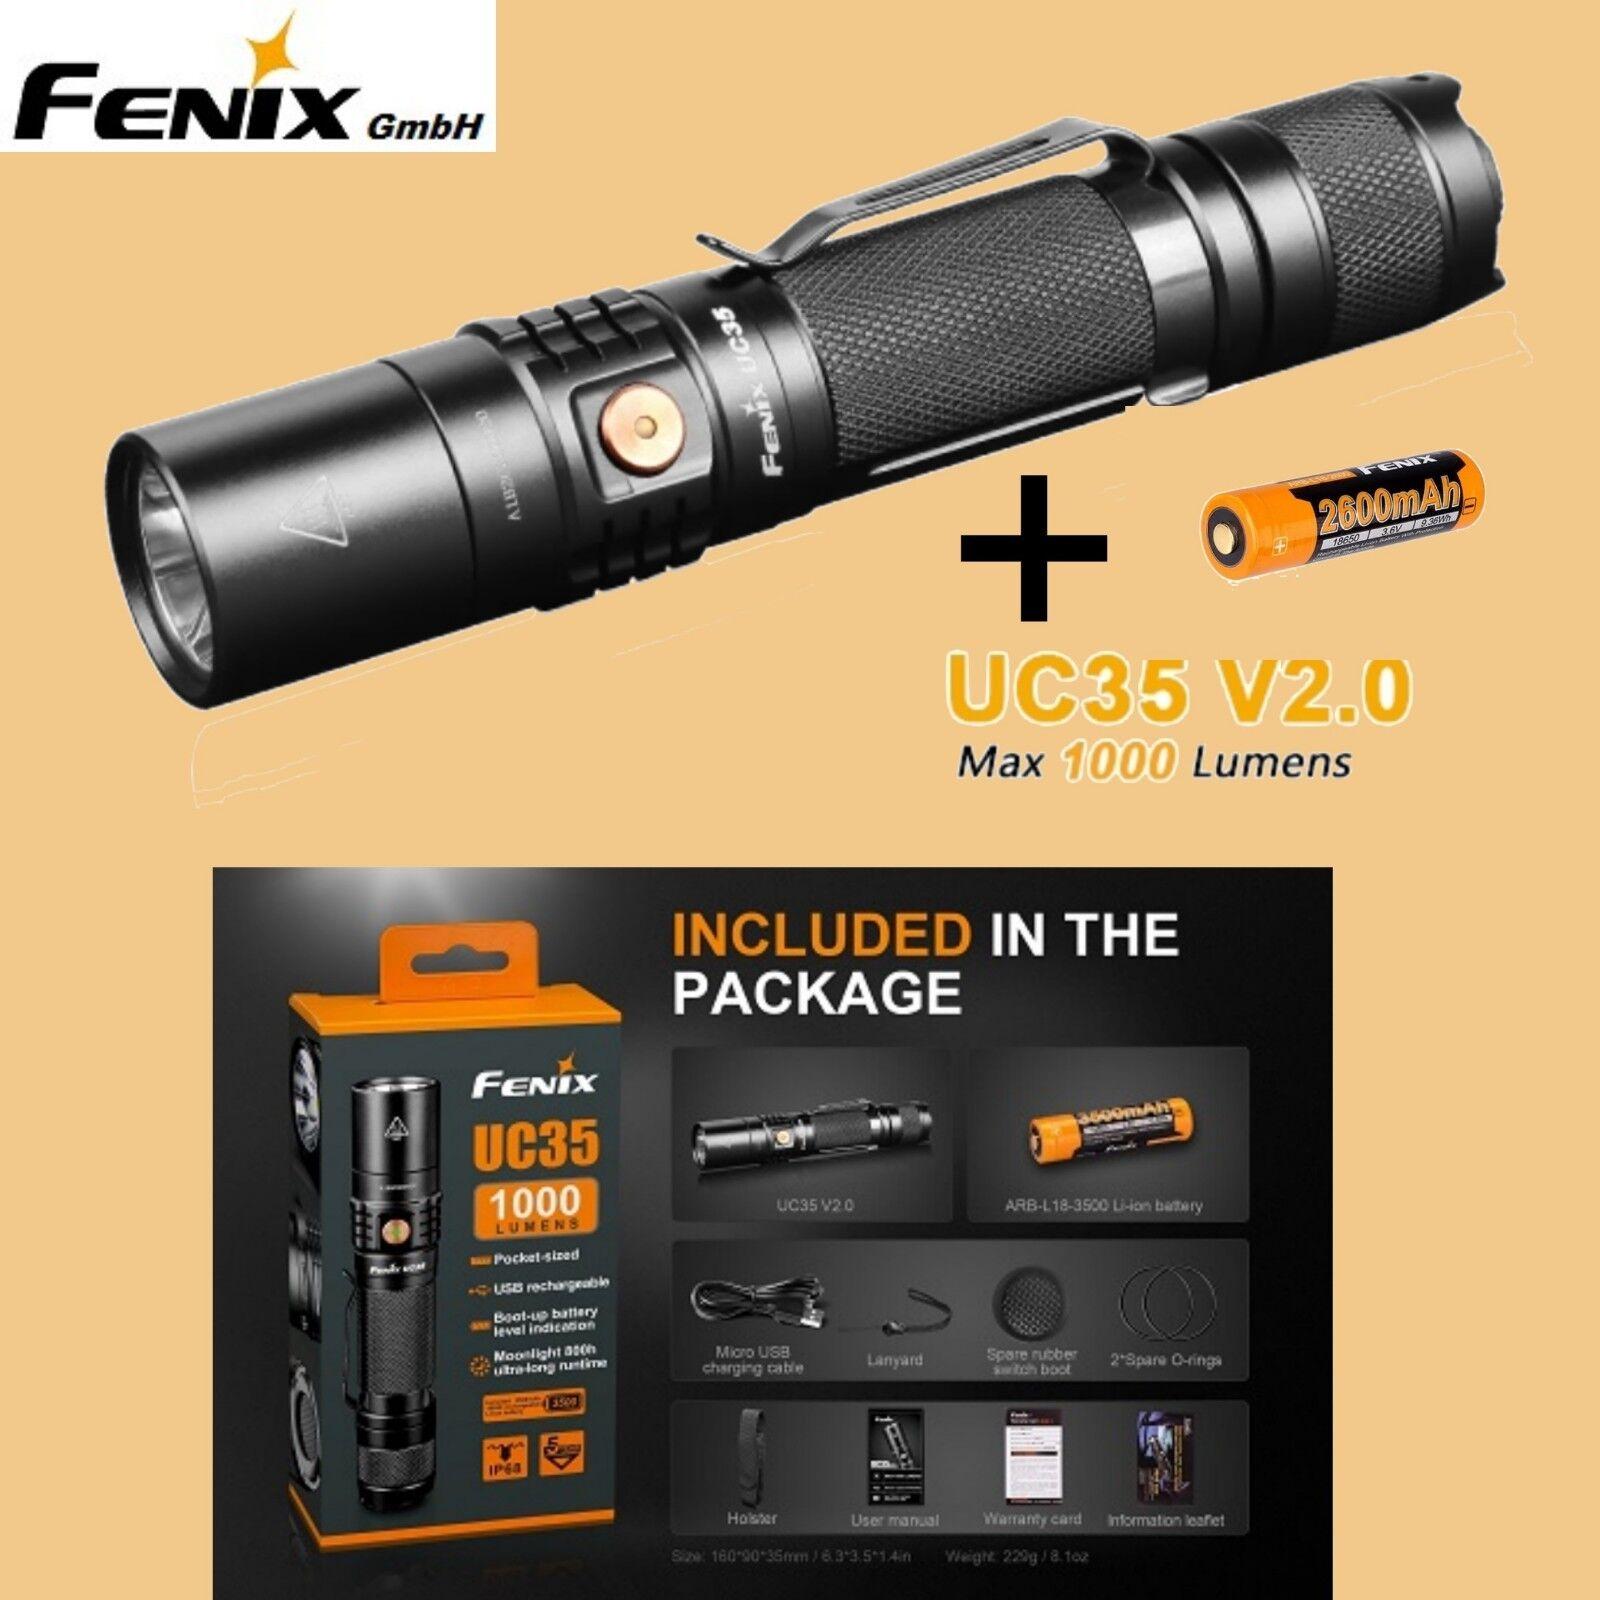 Fenix UC35 V2.0 Gürtelclip LED Taschenlampe USB Kabel Akku Holster Gürtelclip V2.0 Handschlaufe f09c47